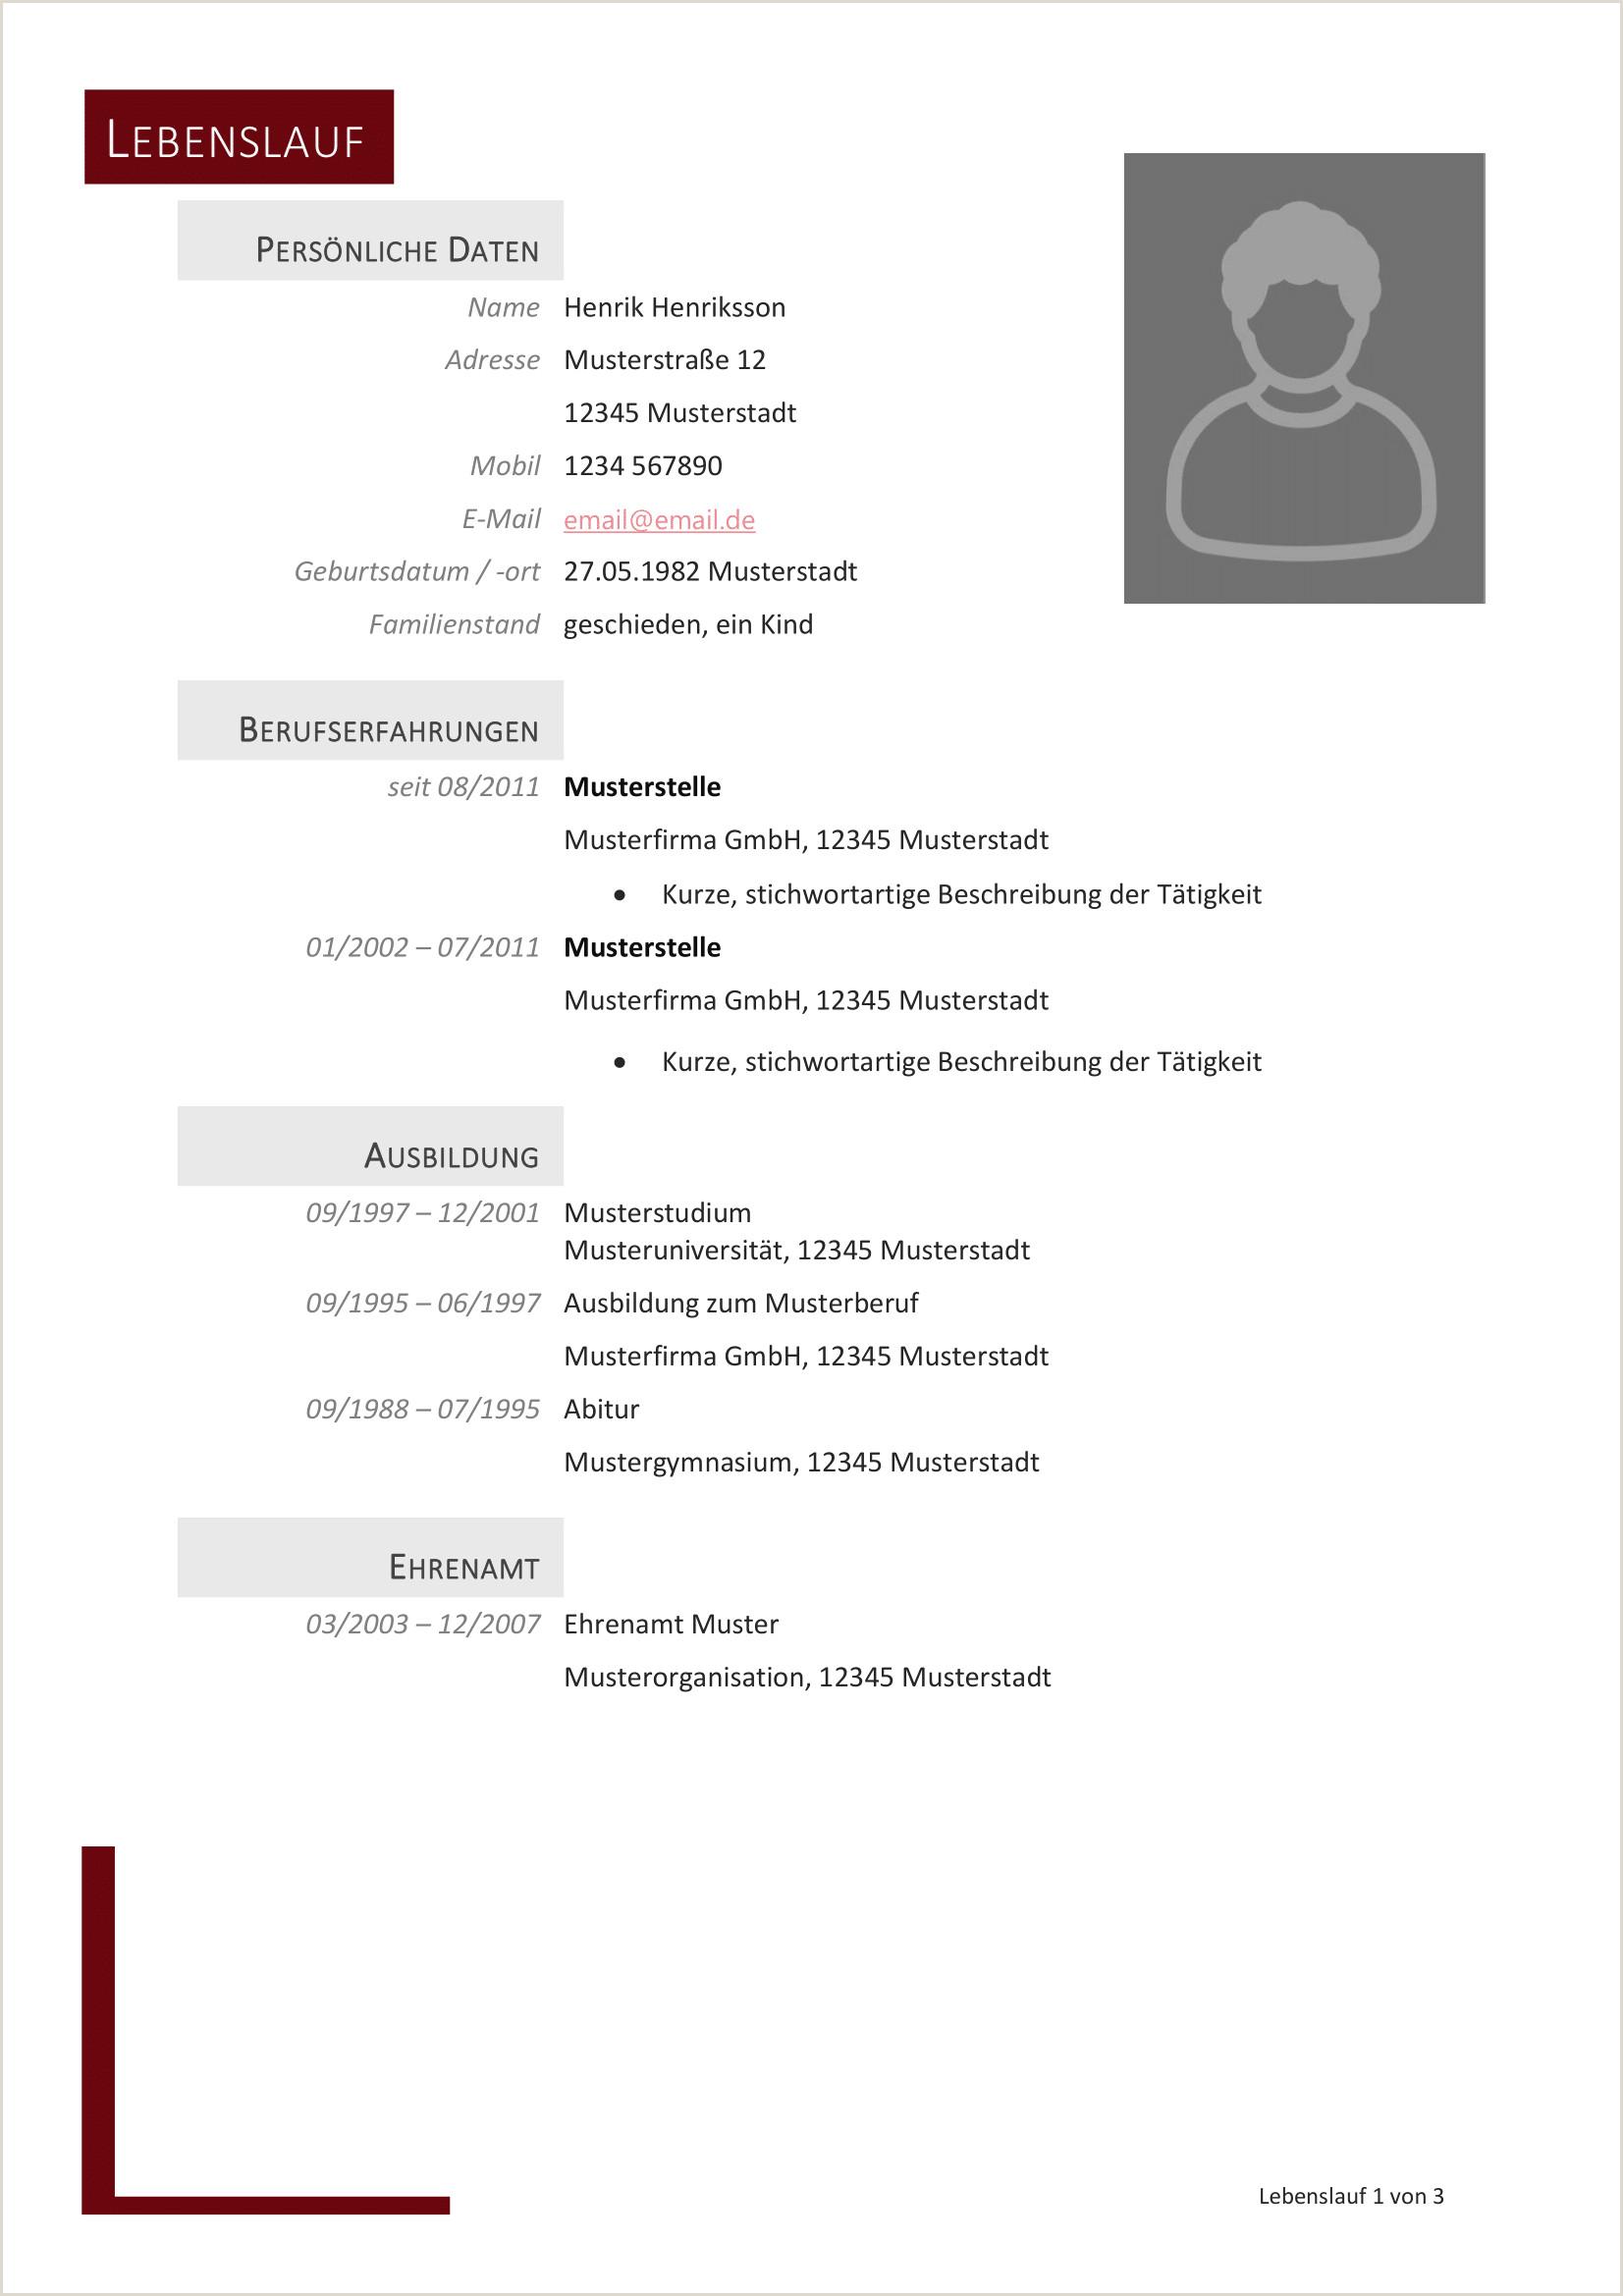 Lebenslauf Vorlage Download Neu Lebenslauf Muster 34